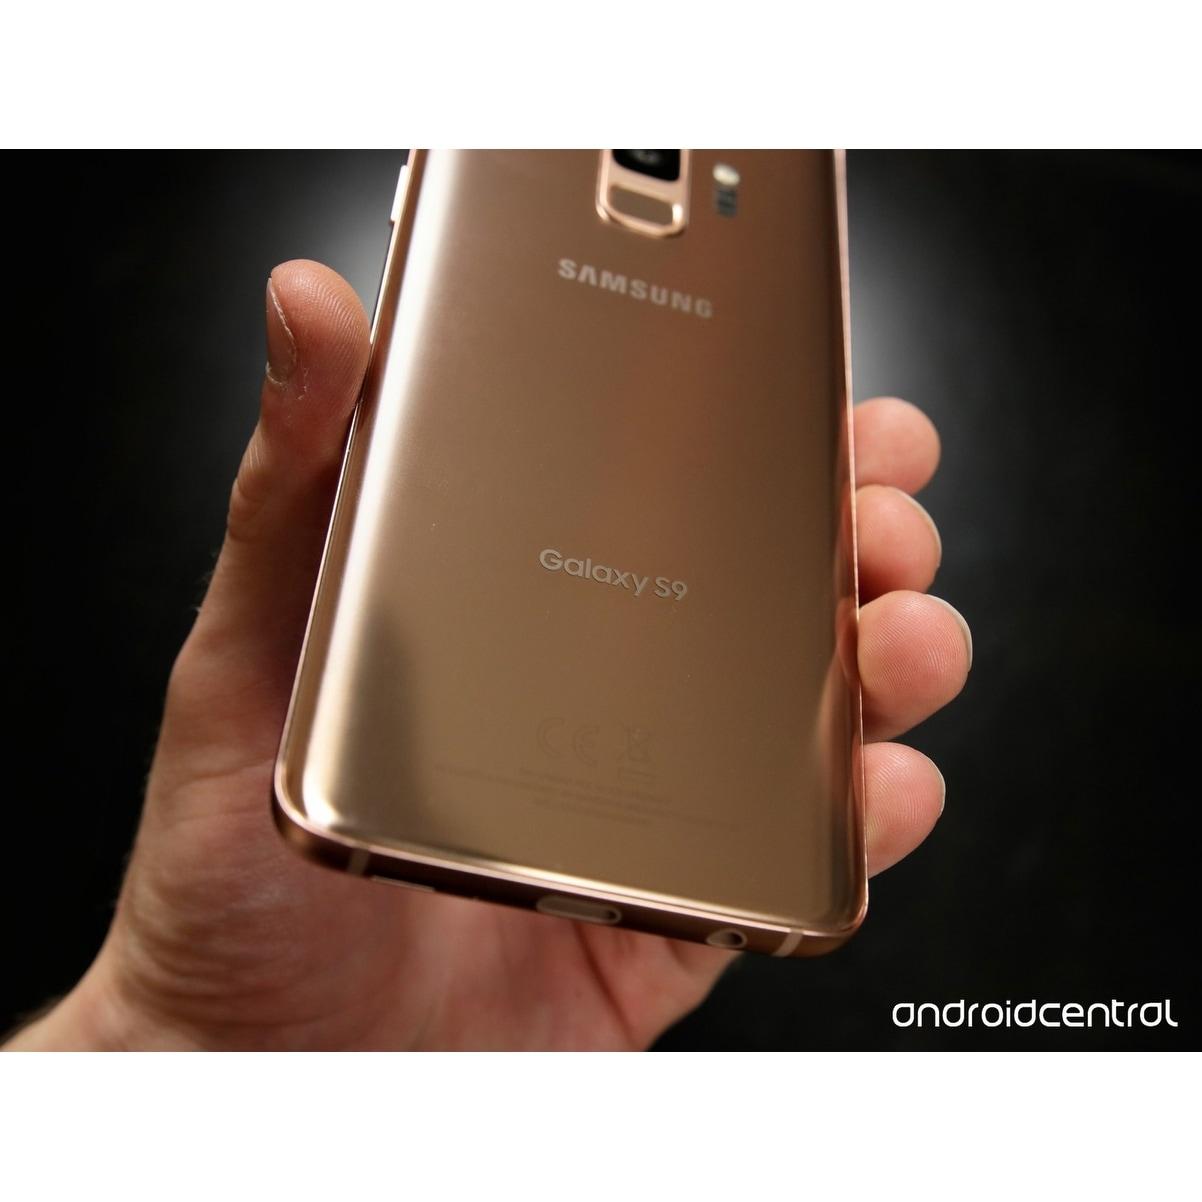 Samsung Galaxy S9 SM-G960U 64GB 4G LTE UNLOCKED (Verizon, AT&T, T-Mobile)  5 8